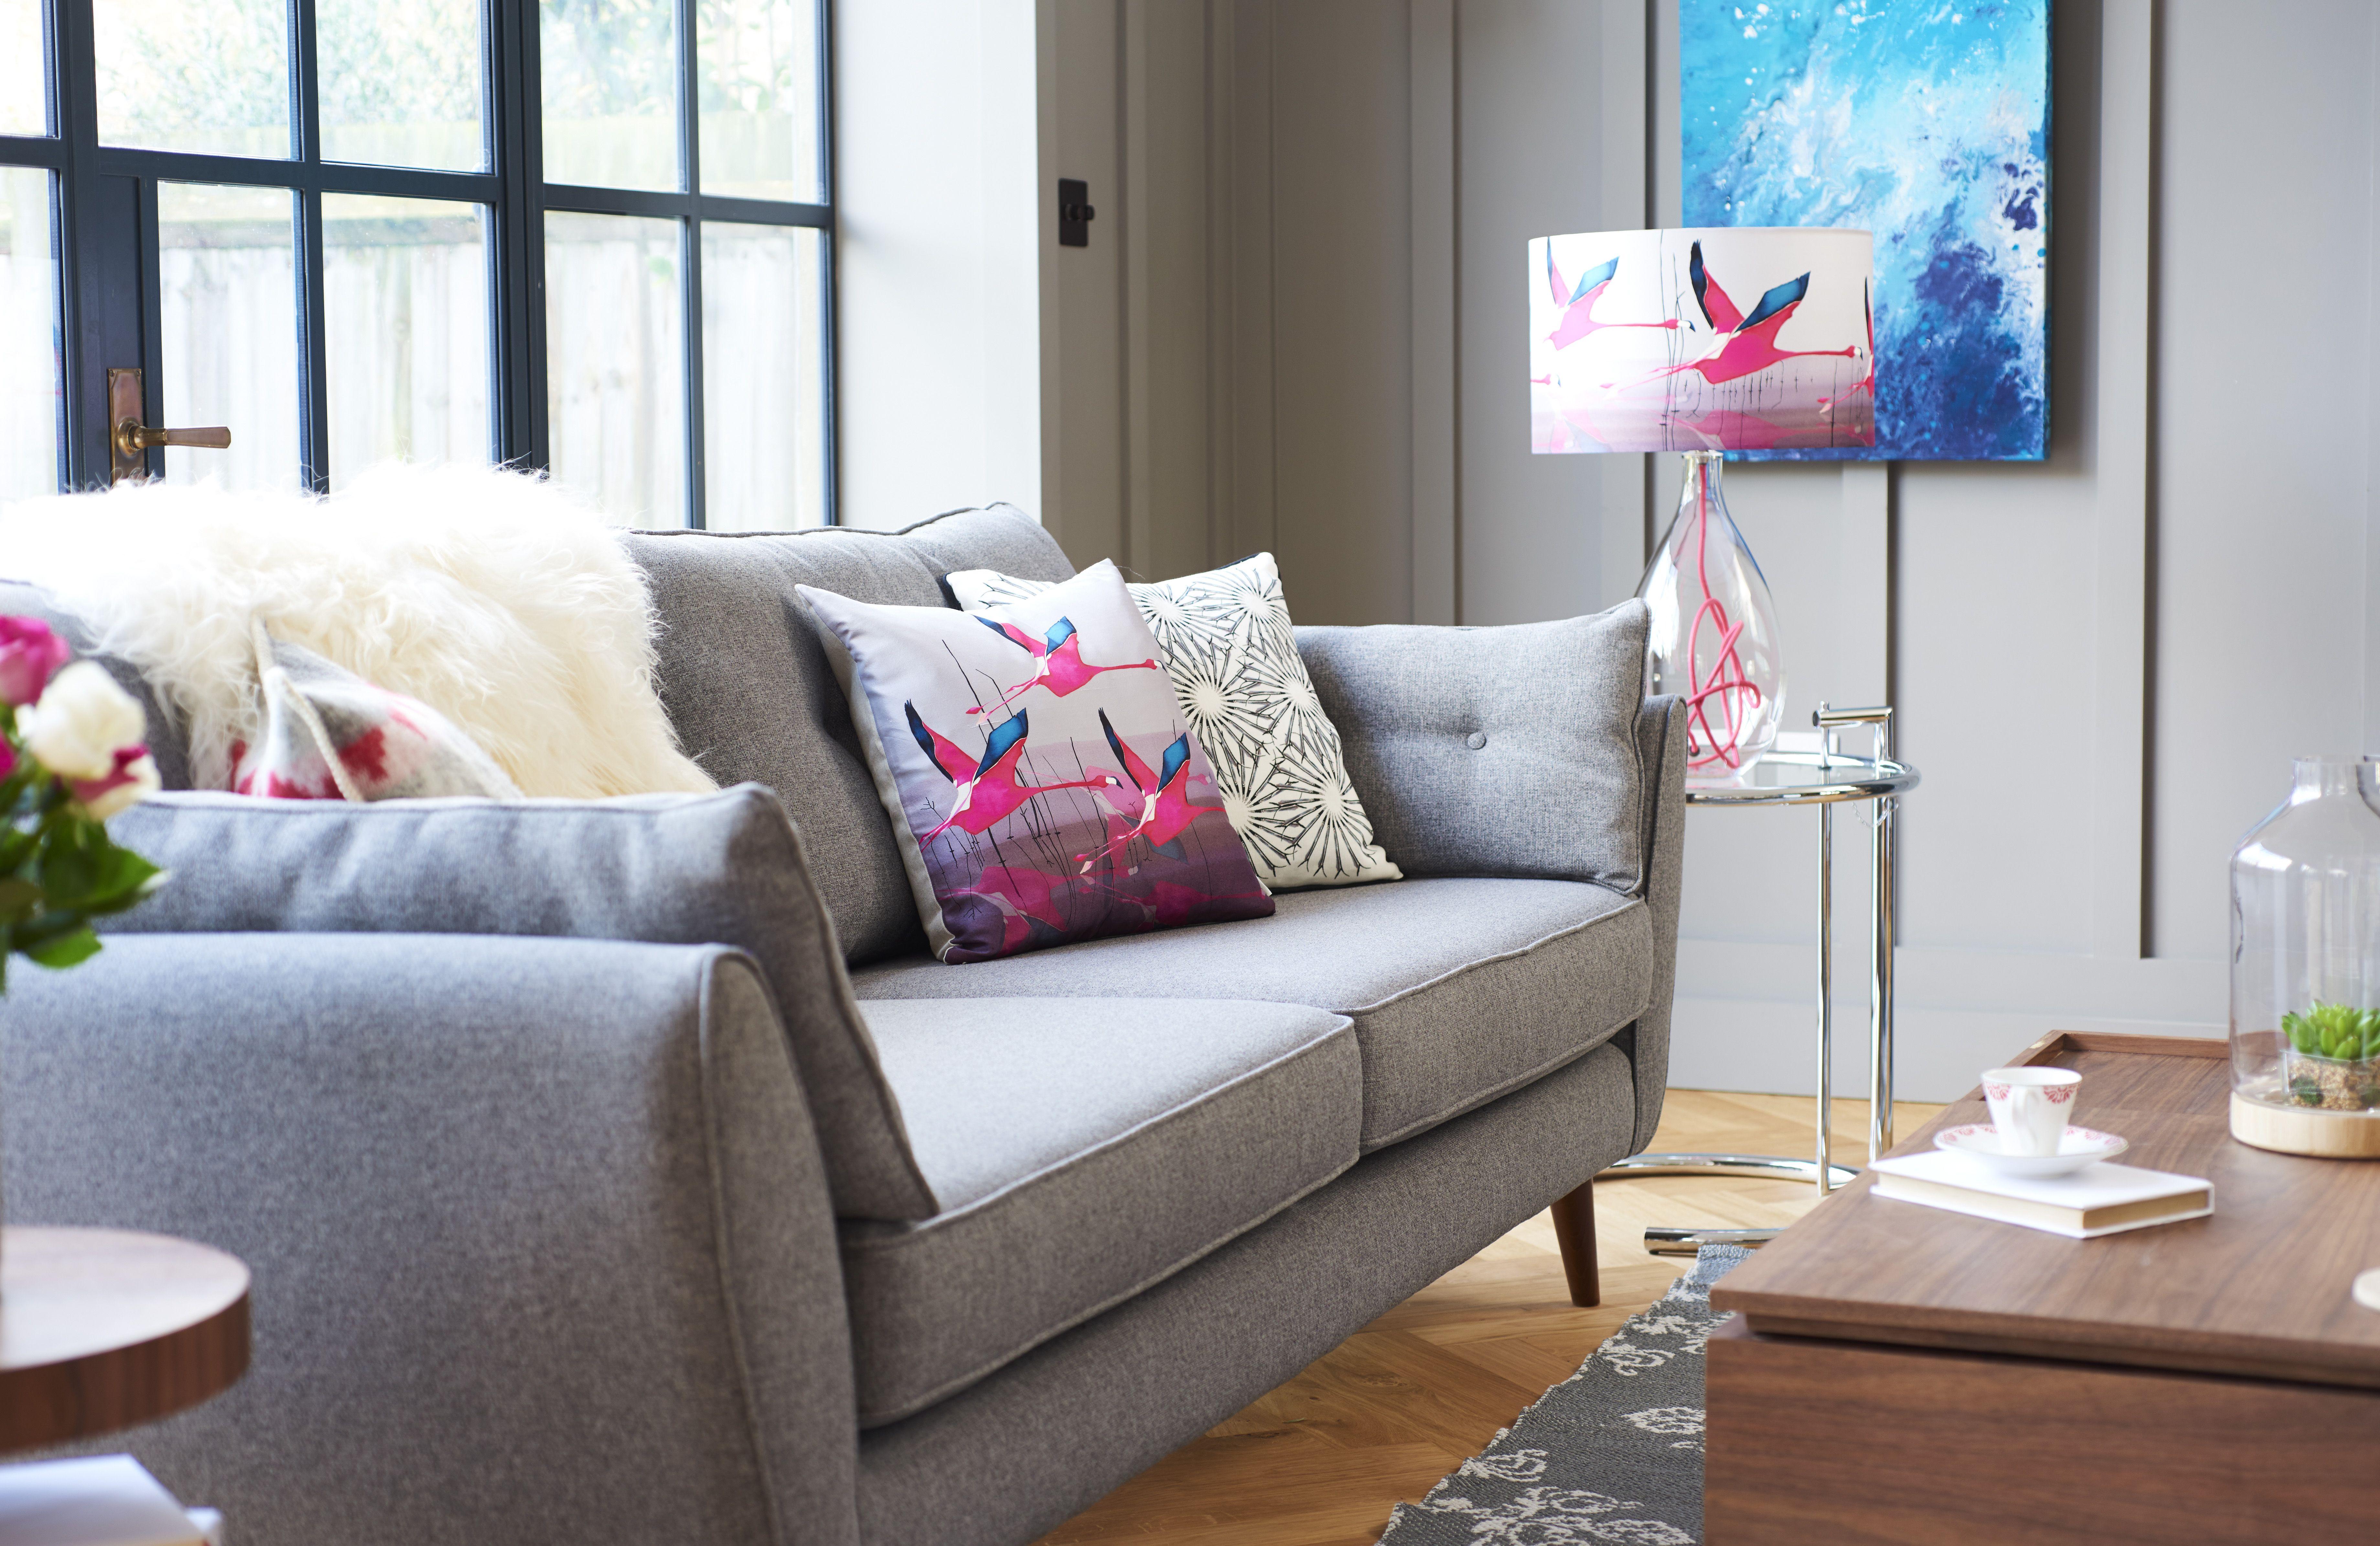 Zinc 4 Seater Sofa As Styled By Deardesigner I Dfs I Blog I Http Www Dfs Co Uk Zinc 4 Seater Sofa Zinc Partner Google Medium Pl Living Room Sofa Room Decor